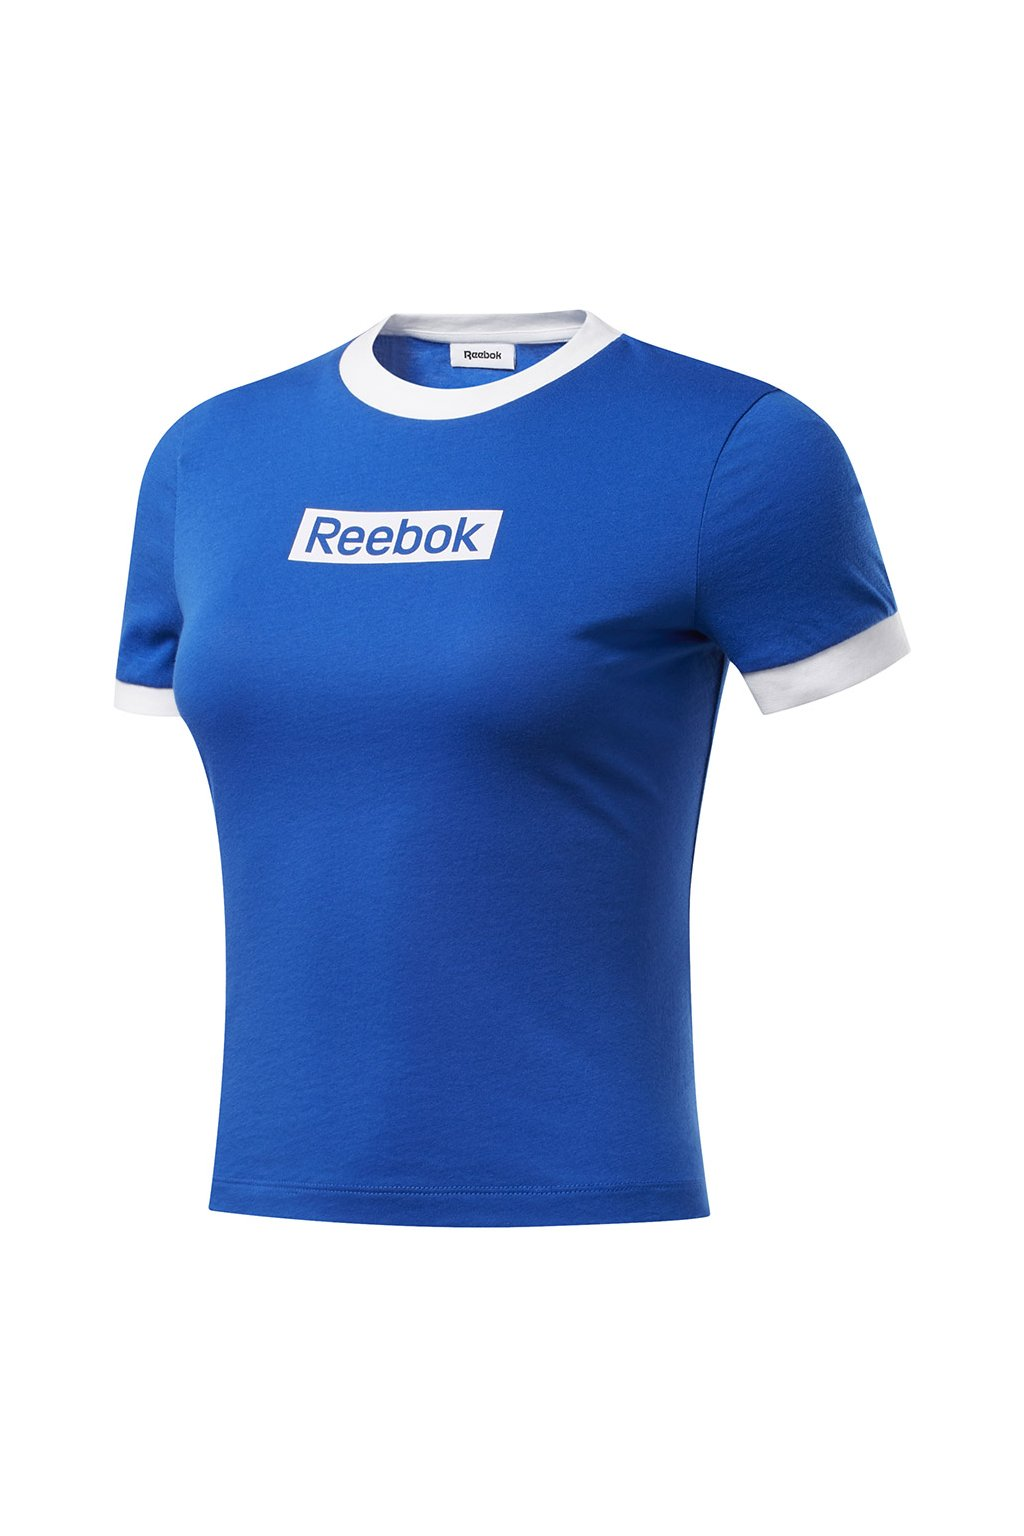 Dámske tričko Reebok Training Essentials Linear Logo Tee modro-biele FK6682